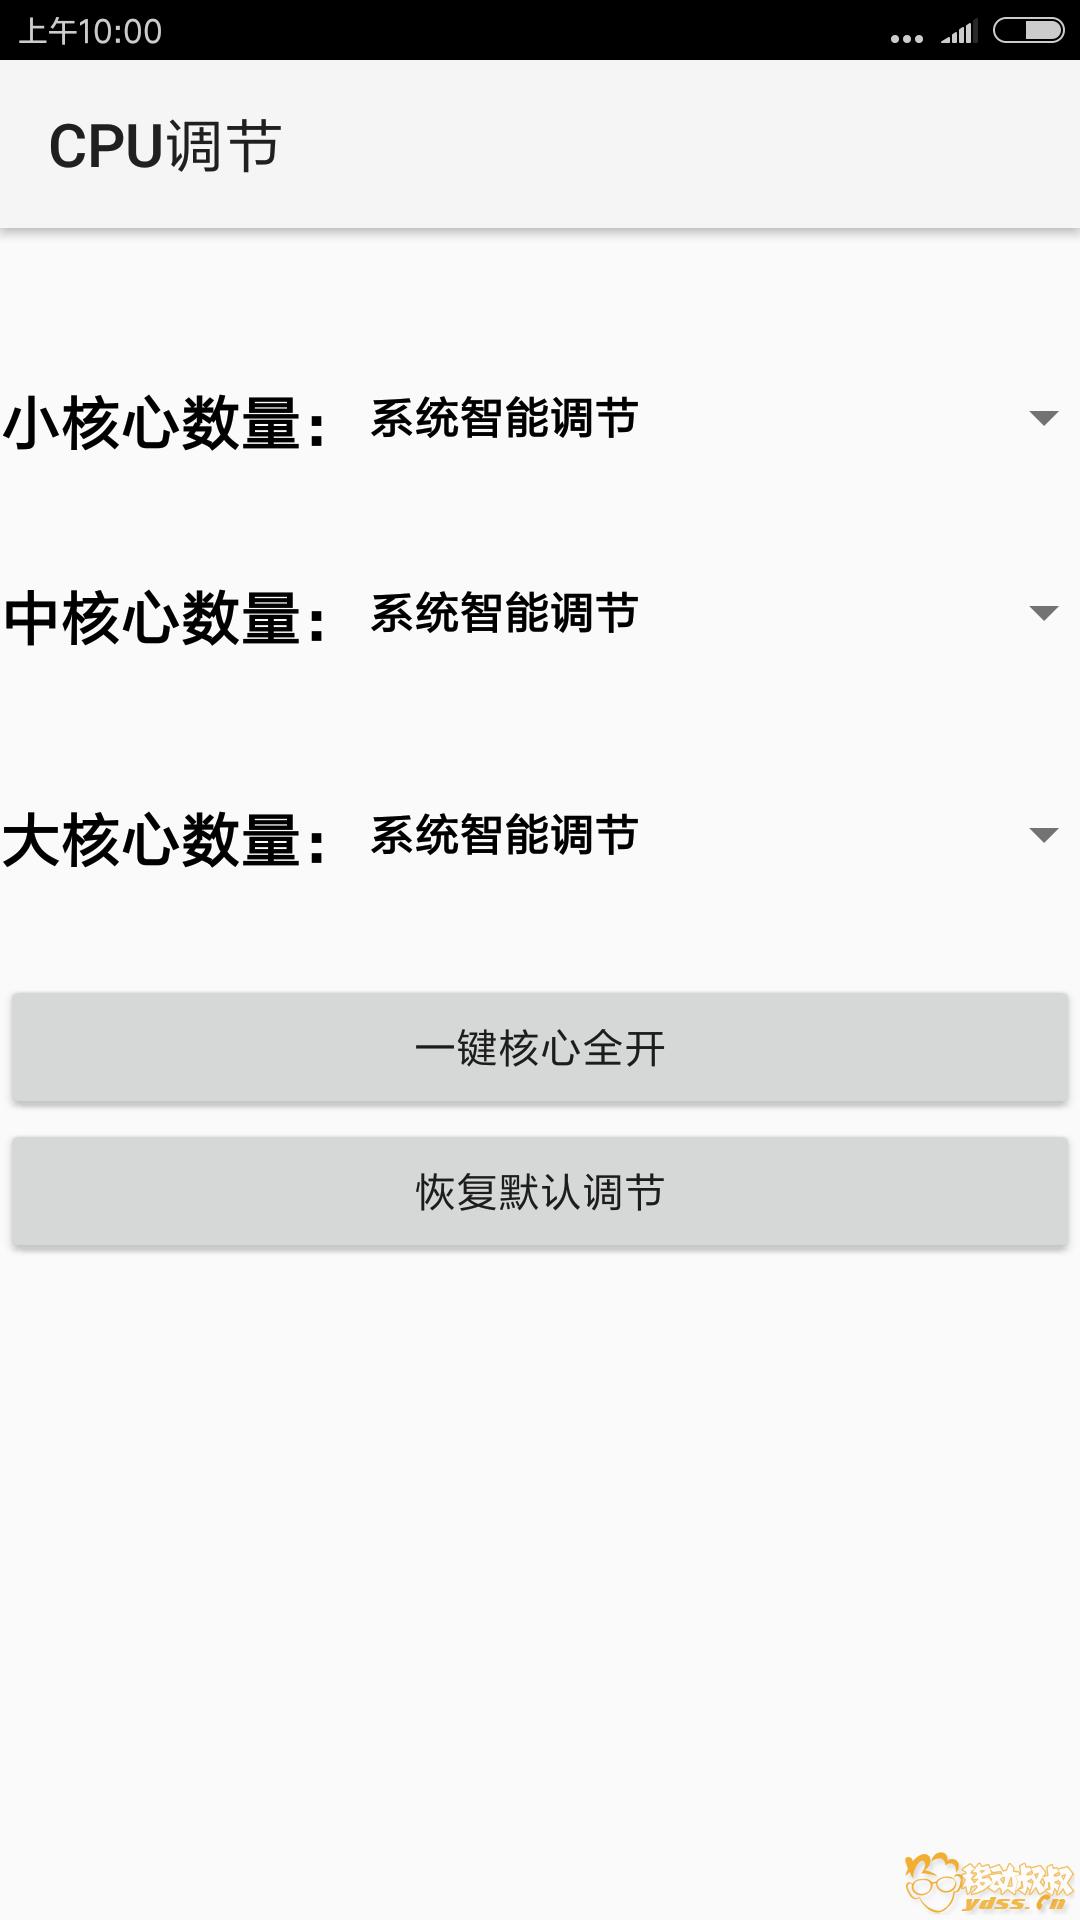 Screenshot_2017-05-17-10-00-04-256_com.eui.xd.png